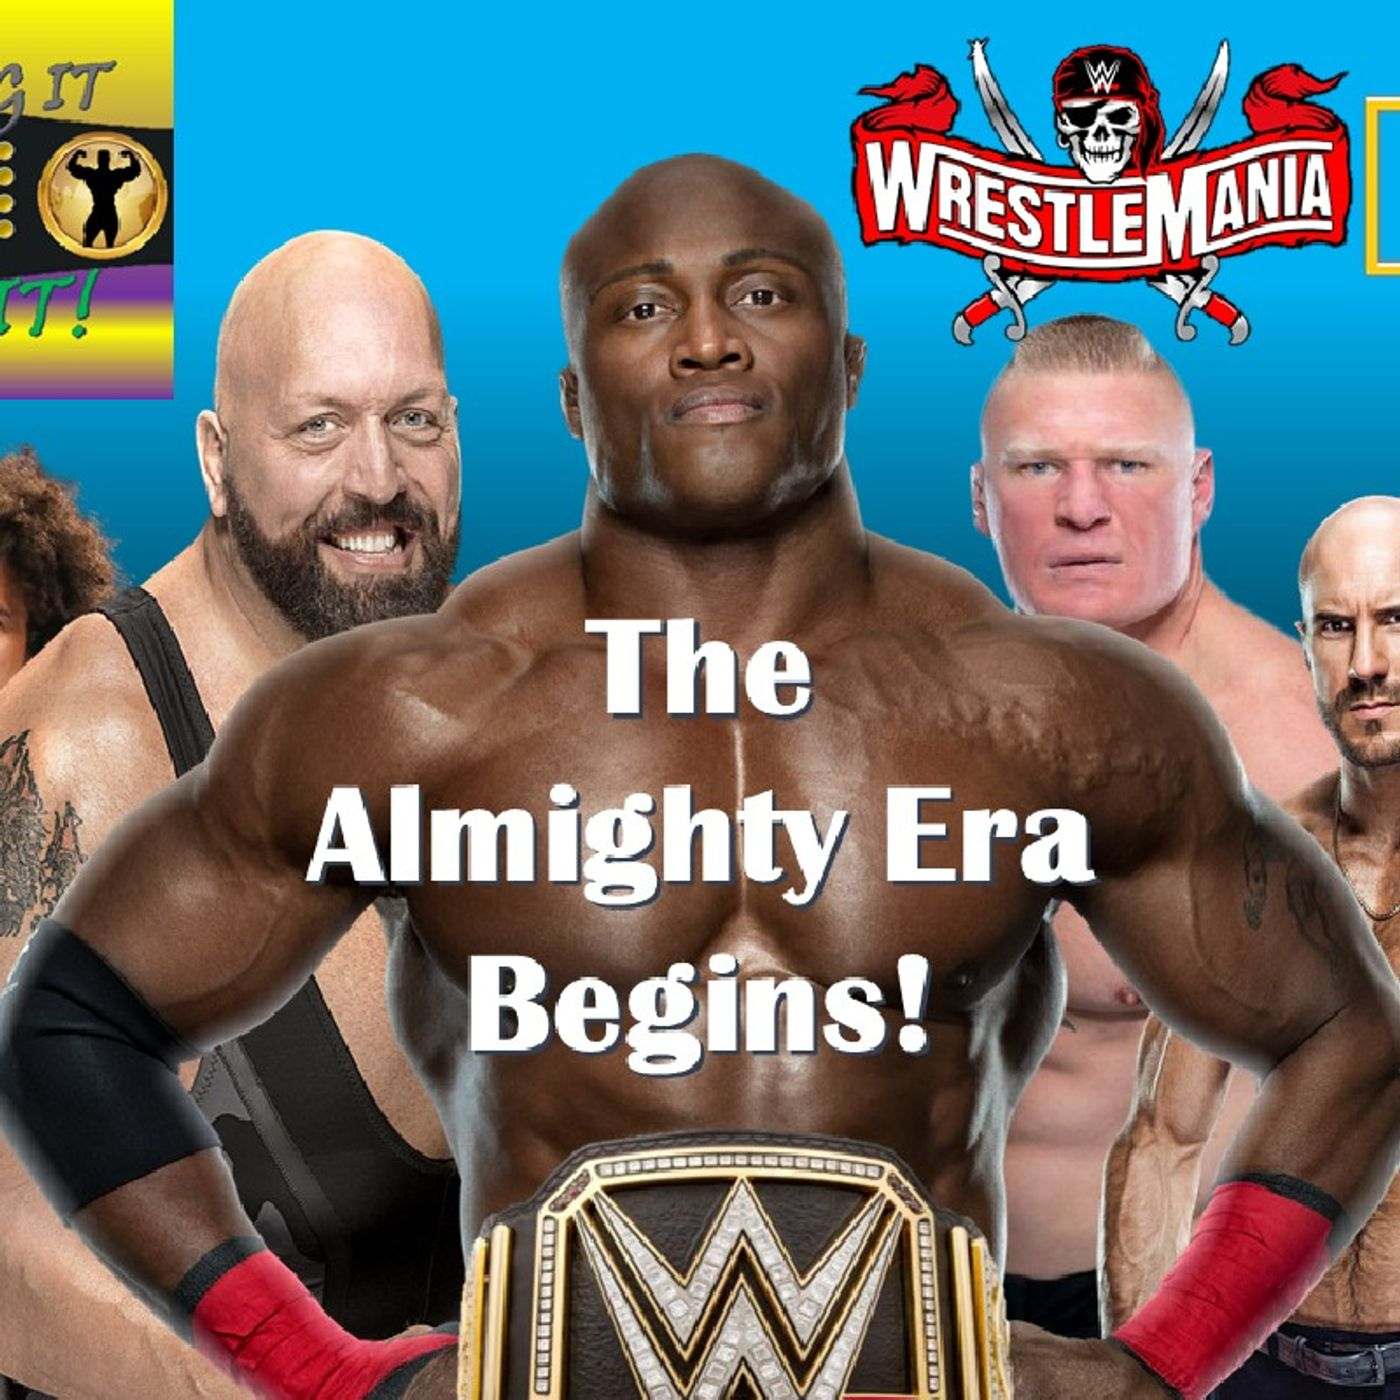 The Almighty Era Begins - Bobby Lashley WWE Champion